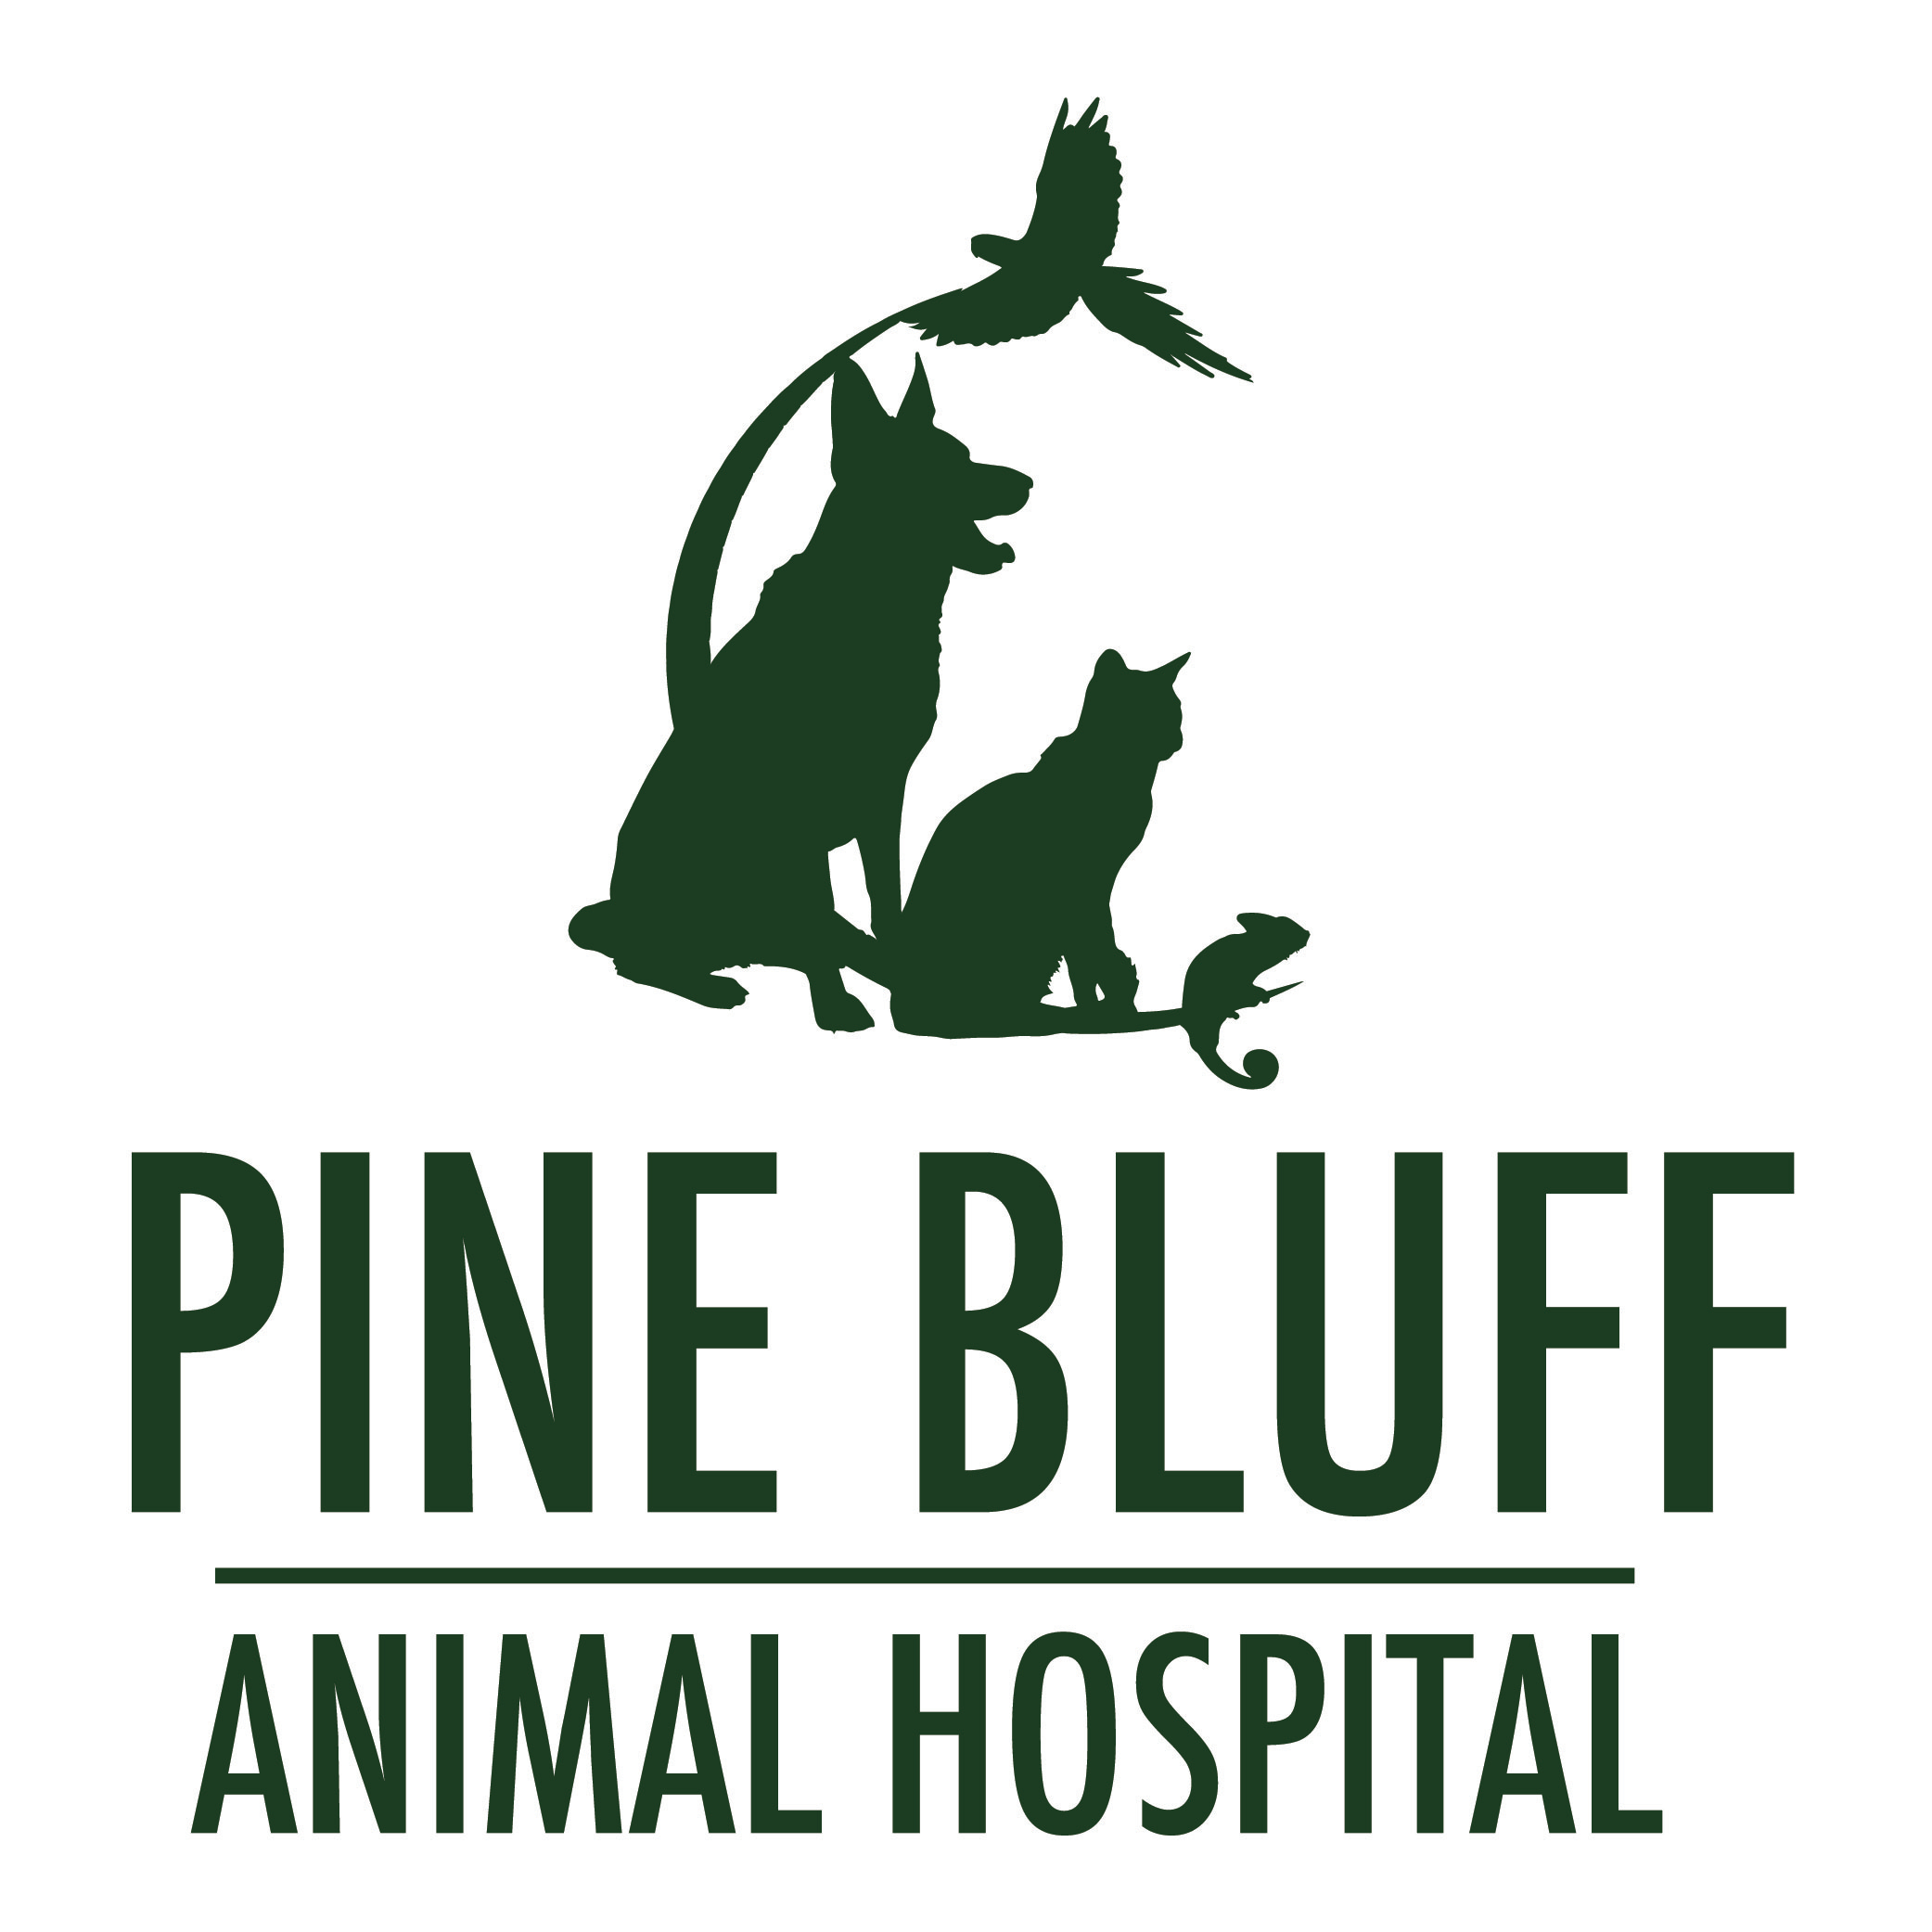 Pine Bluff Animal Hospital - Morris, IL 60450 - (815)942-5365 | ShowMeLocal.com